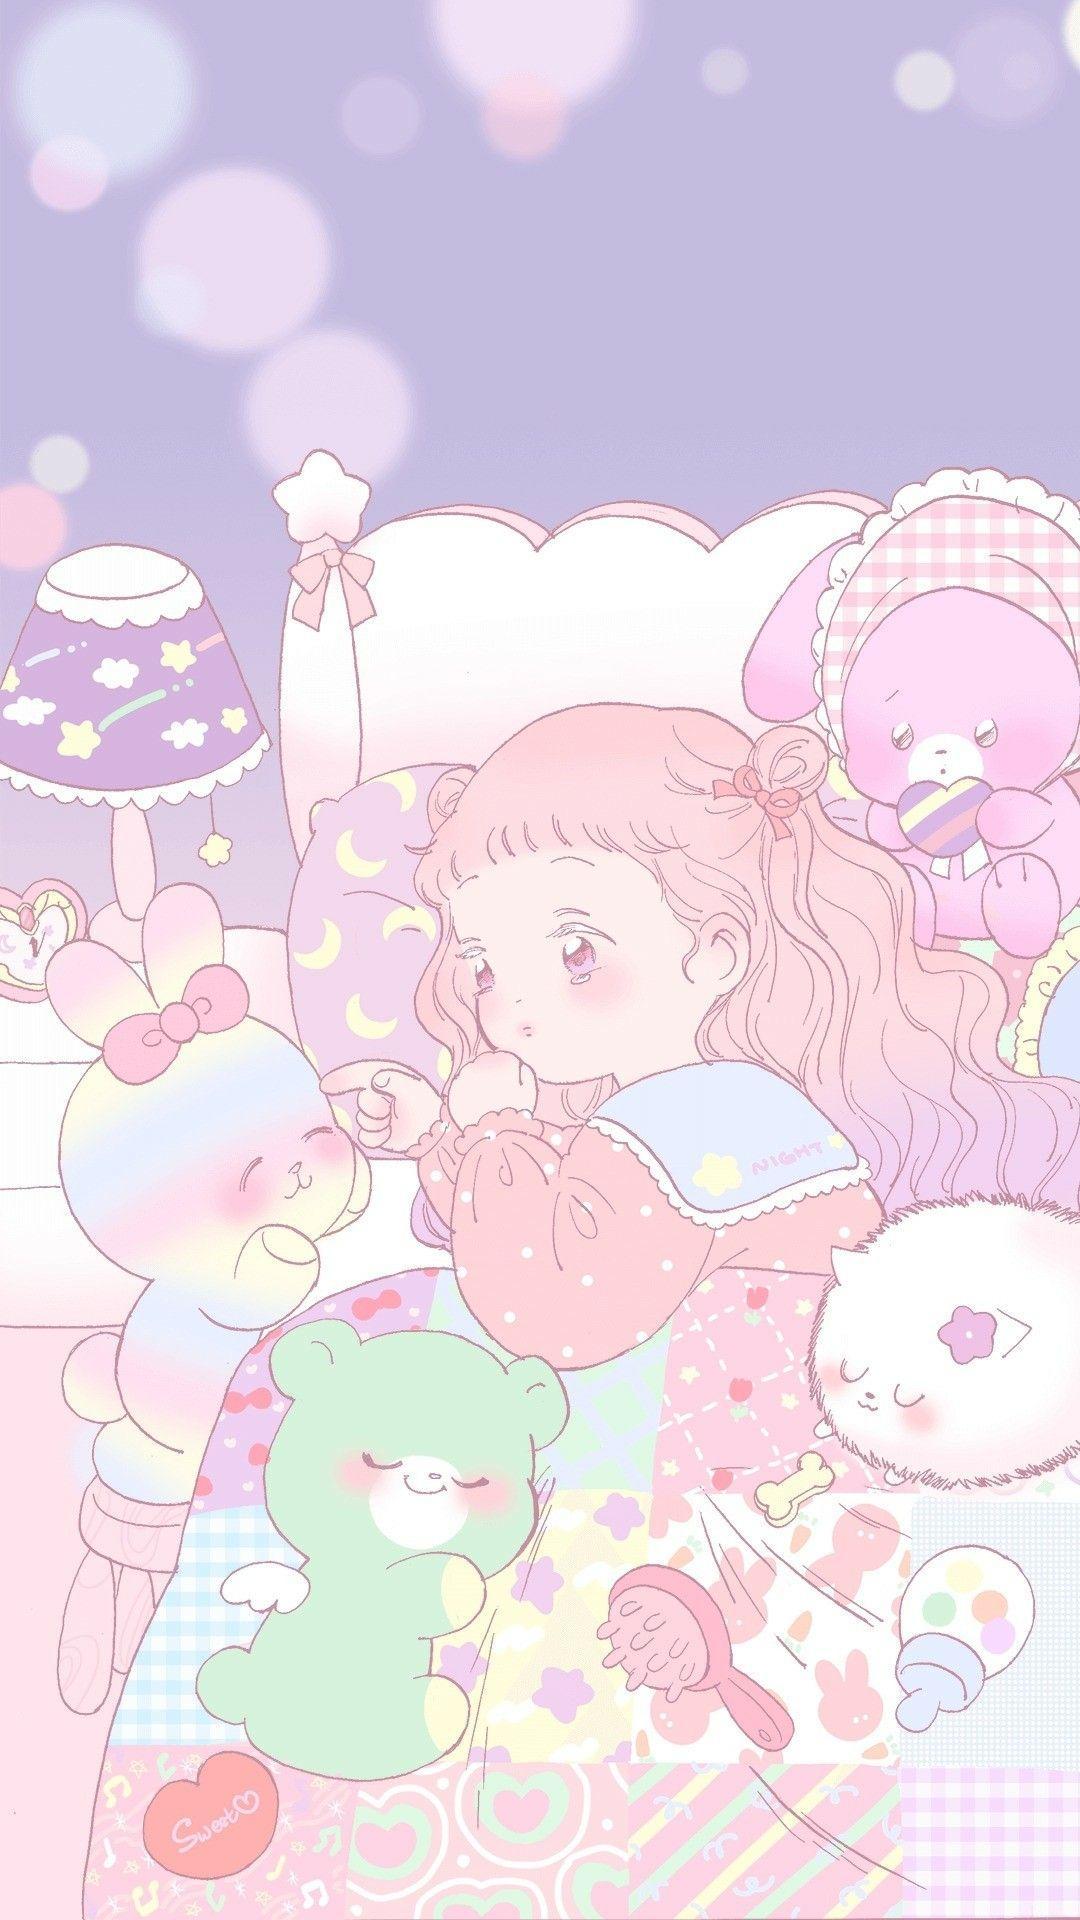 Kawaii Wallpaper Anime : kawaii, wallpaper, anime, Kawaii, Pastel, Anime, Wallpapers, Backgrounds, WallpaperAccess